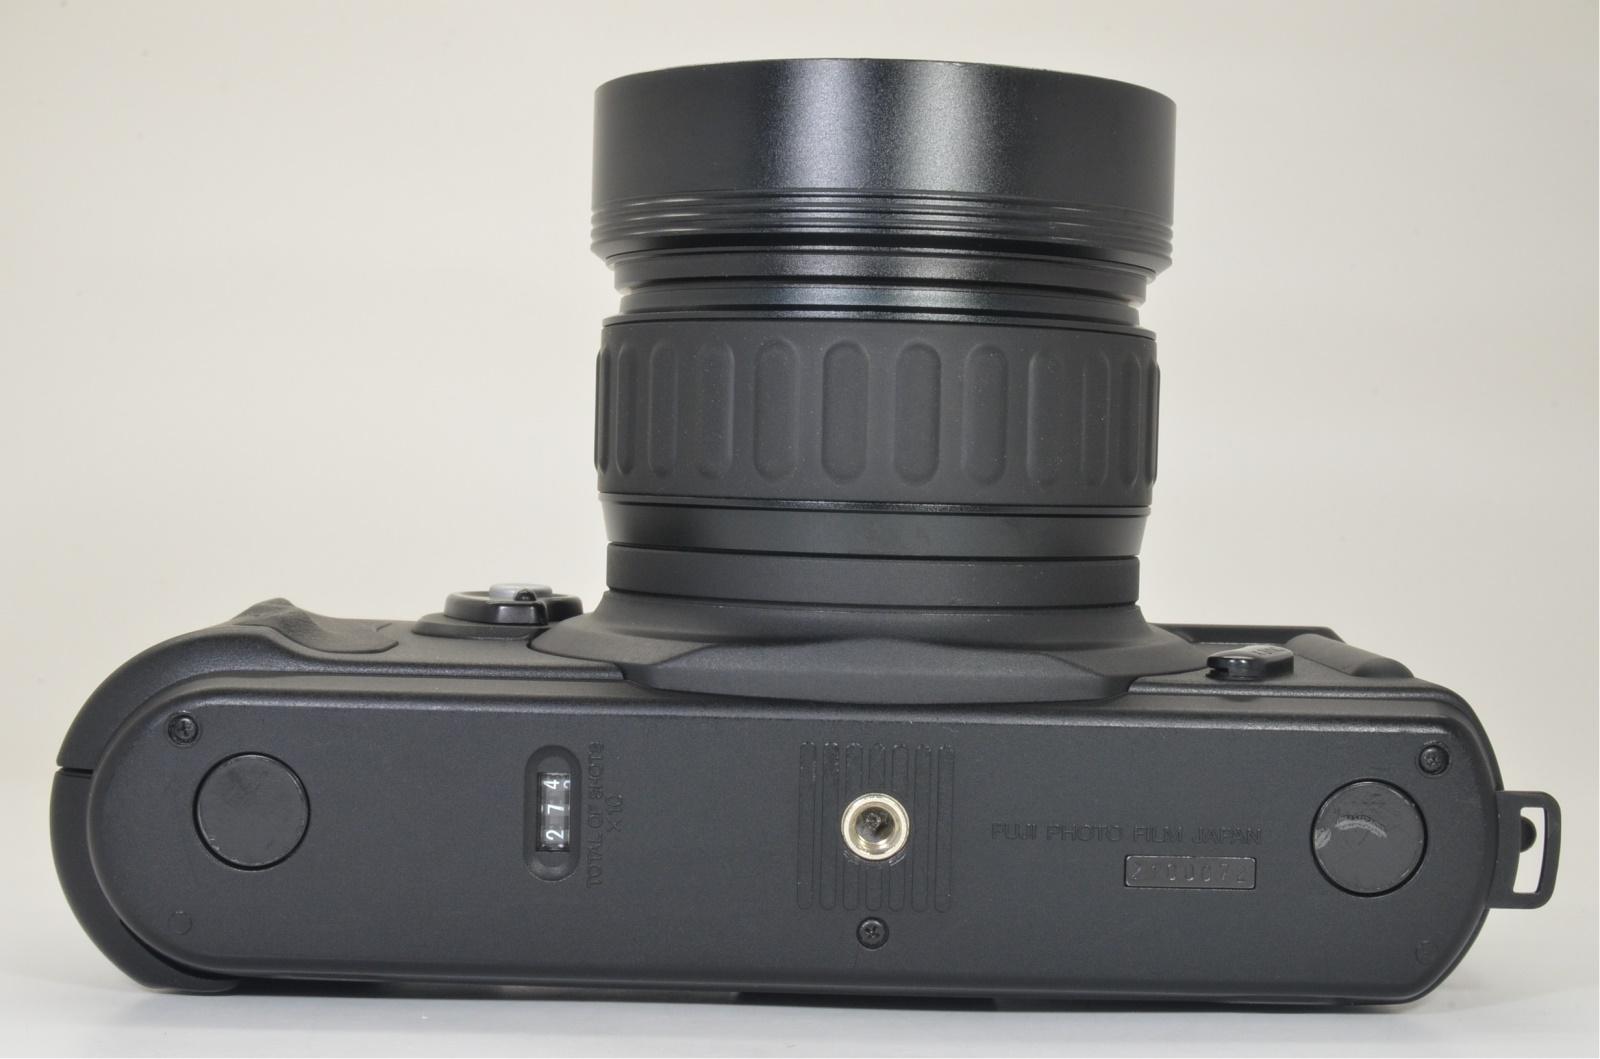 fuji fujifilm gw690iii 90mm f3.5 count 274 medium format camera film tested